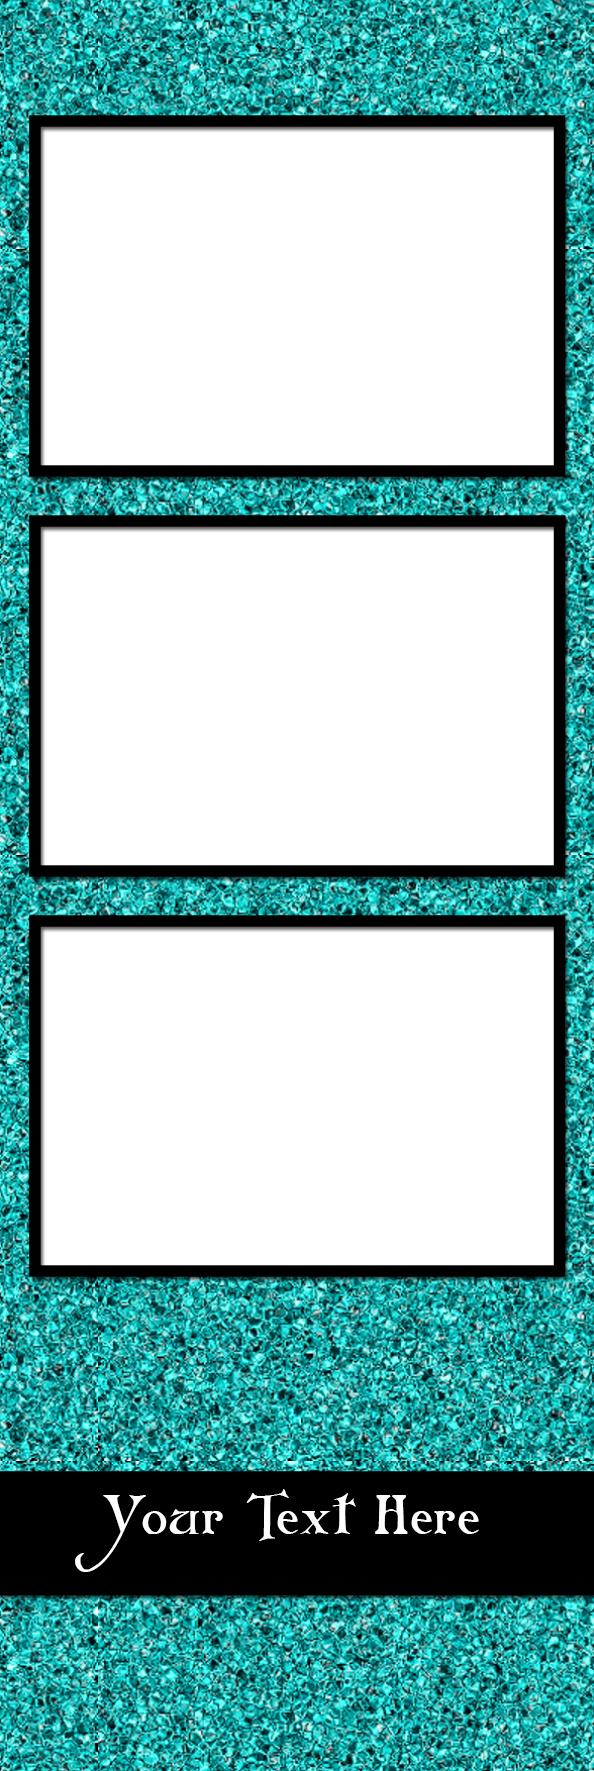 Texture_Glitter-V-6P7.jpg